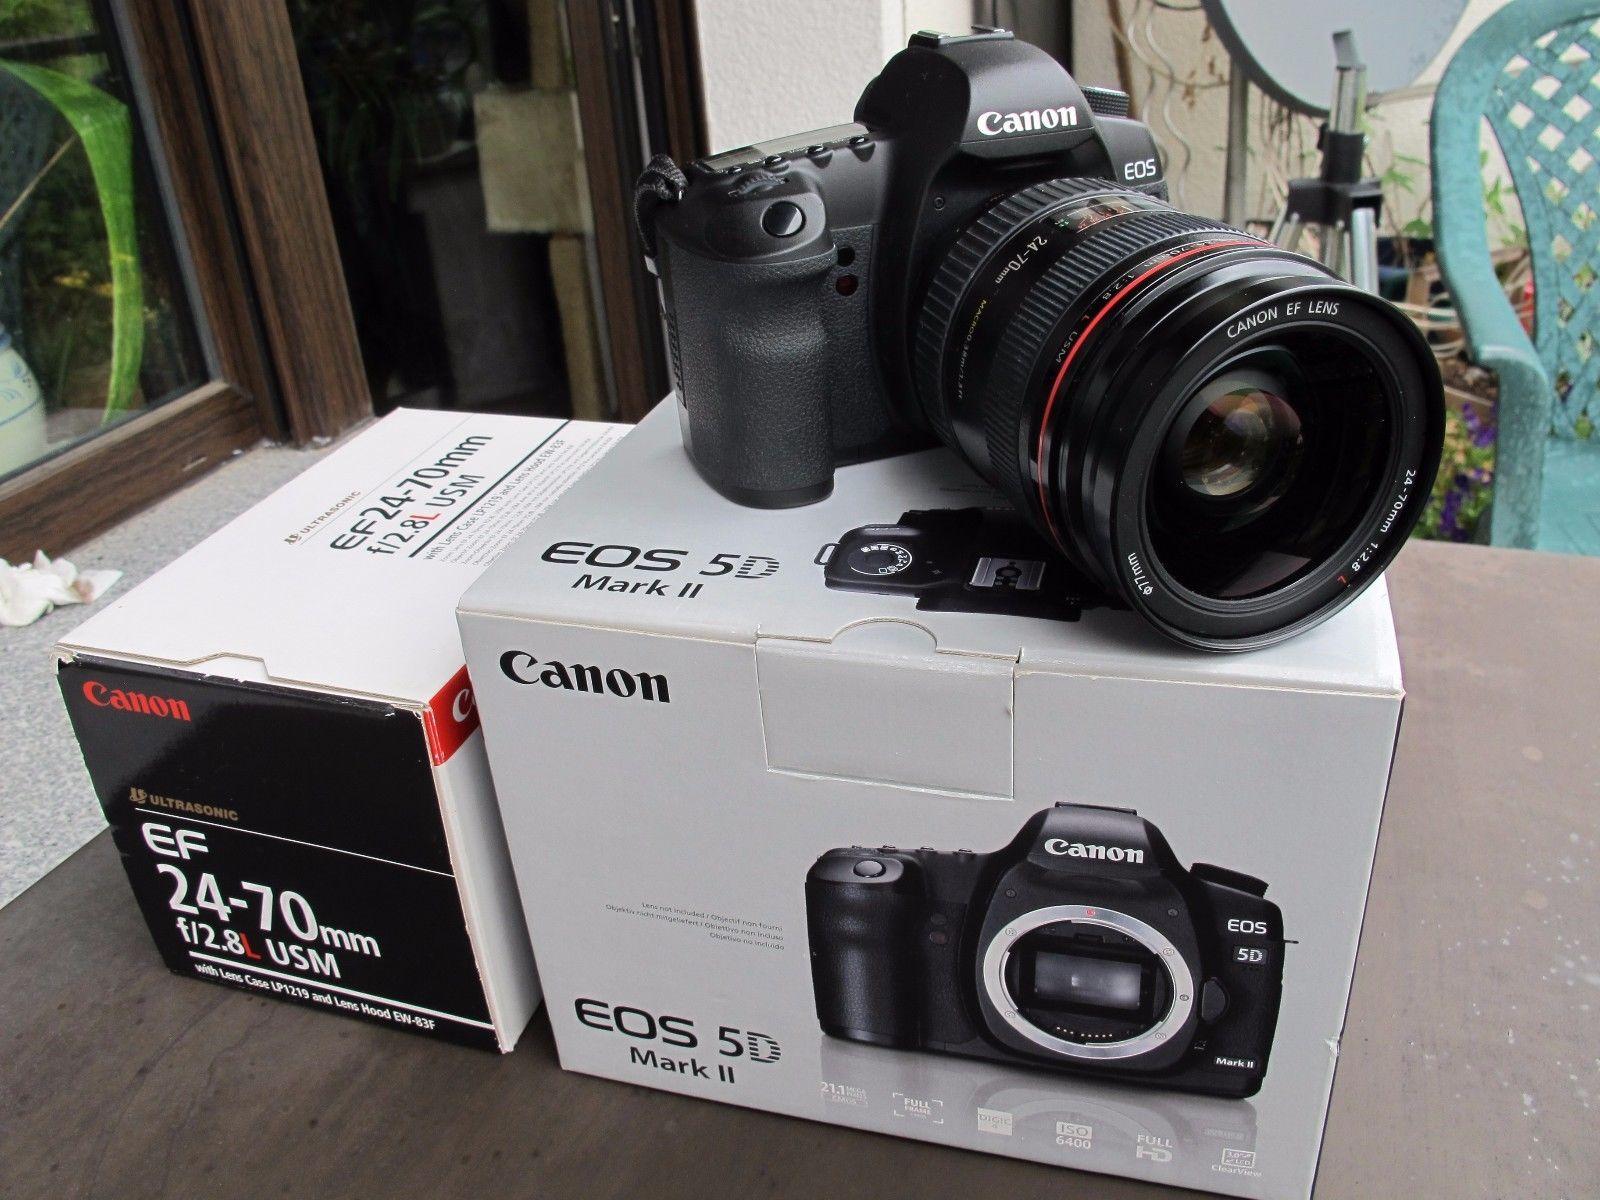 Canon EOS 5D Mark II 21.1MP Digitalkamera - Schwarz (Kit mit EF L USM 24-70mm)